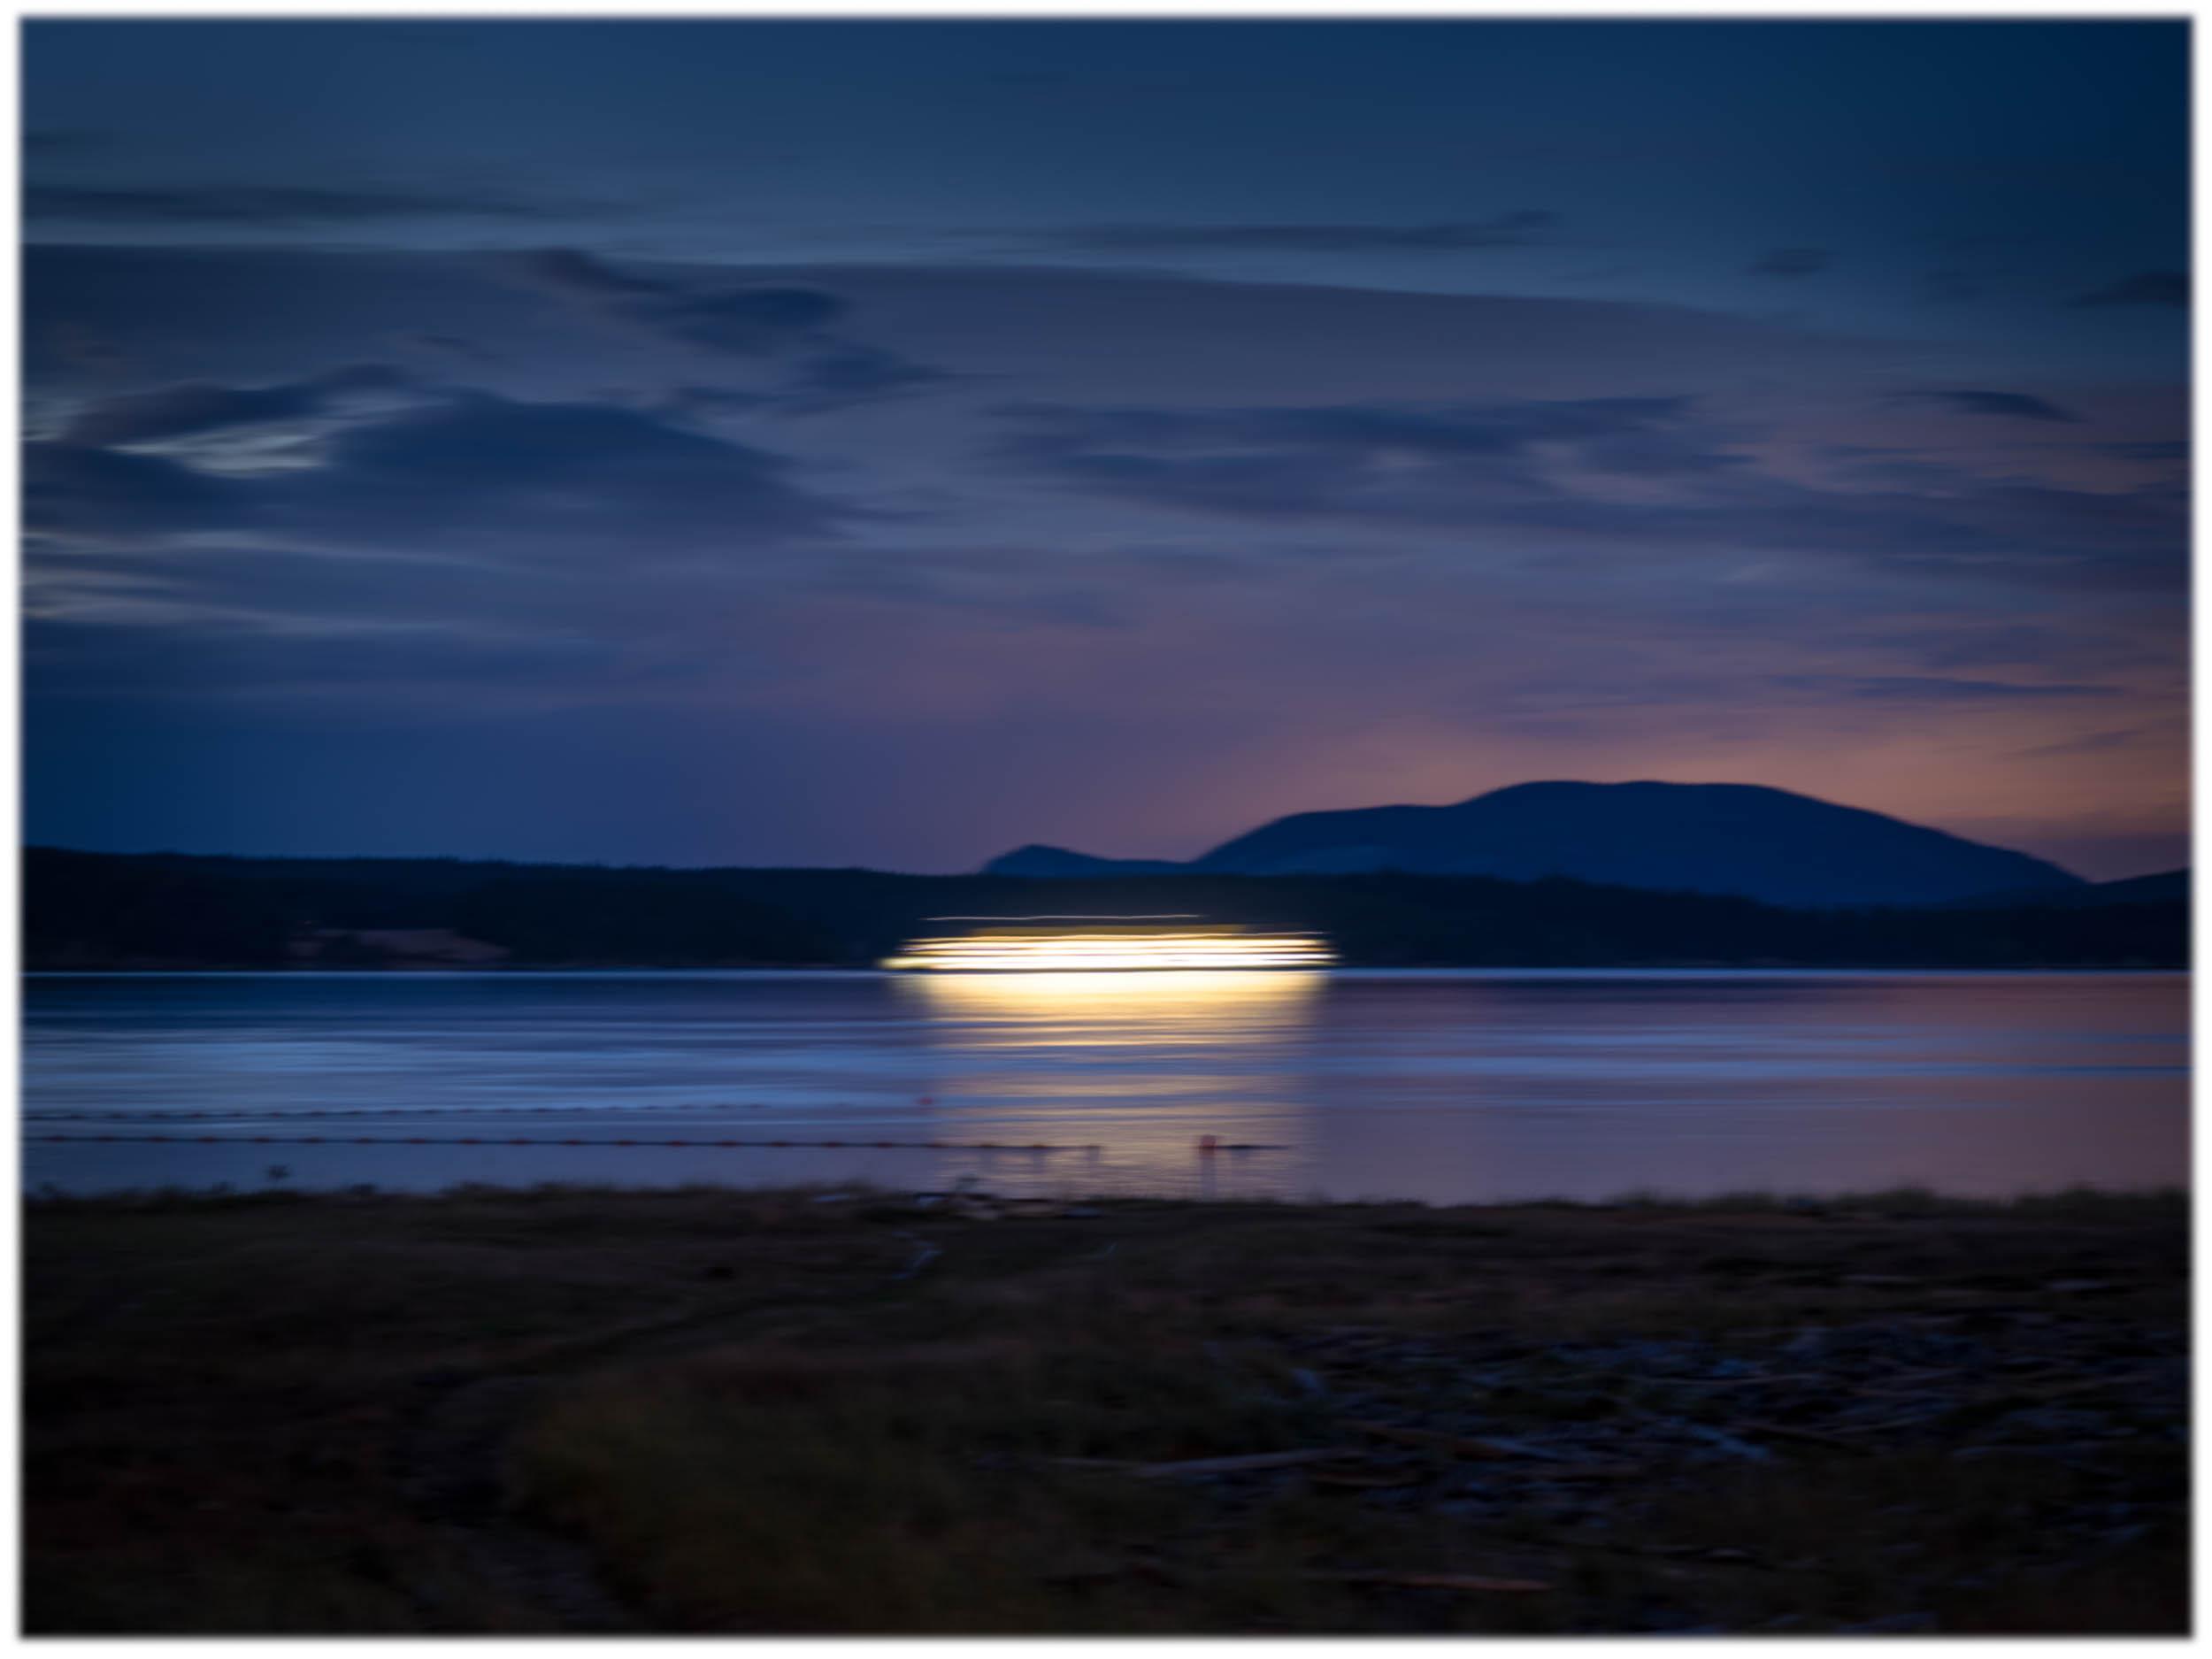 ferry_KH_3126-blur-Edit.jpg